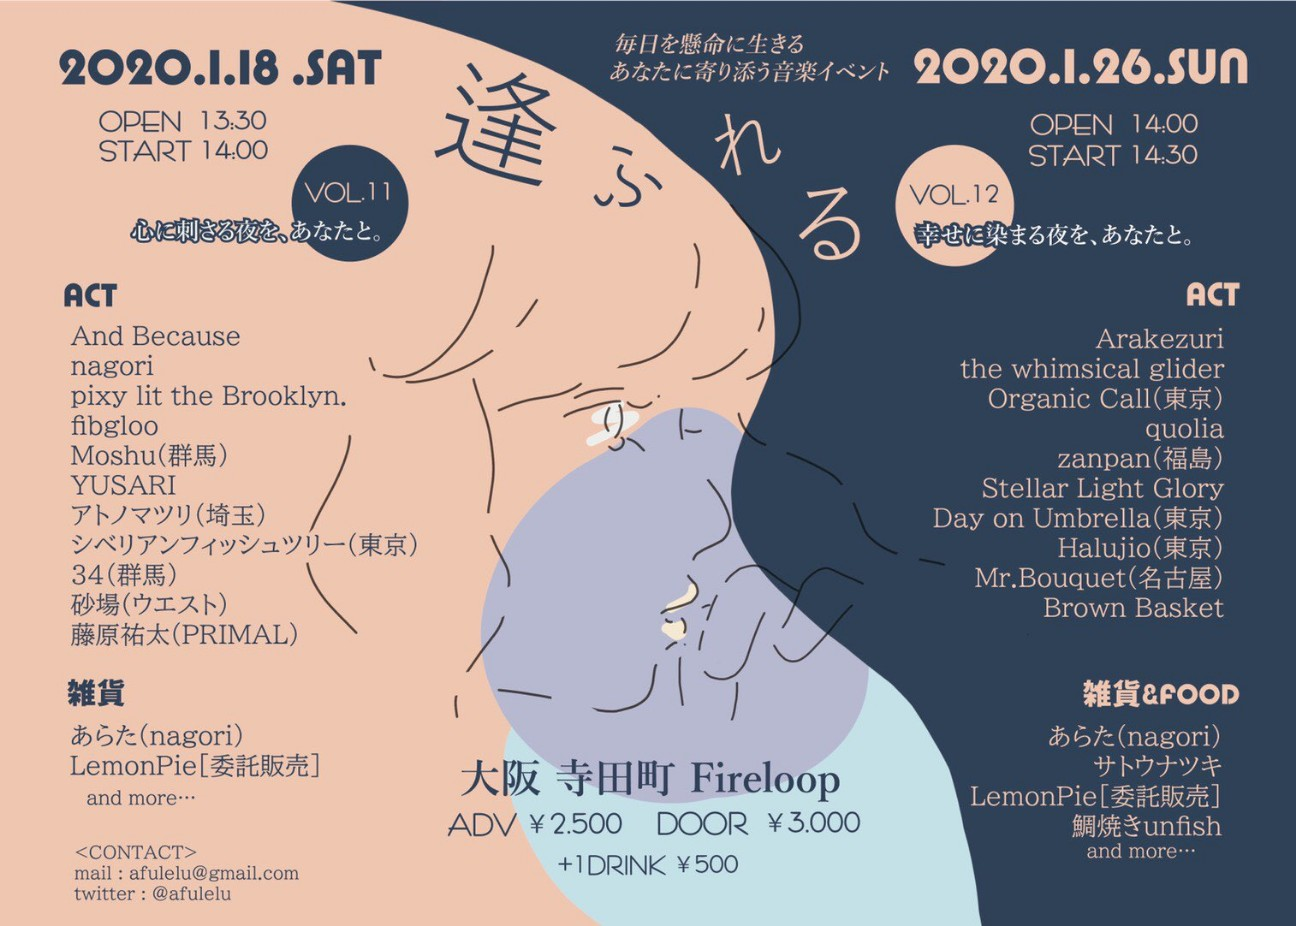 f:id:sakidoriyutsubarock:20200106160529j:plain